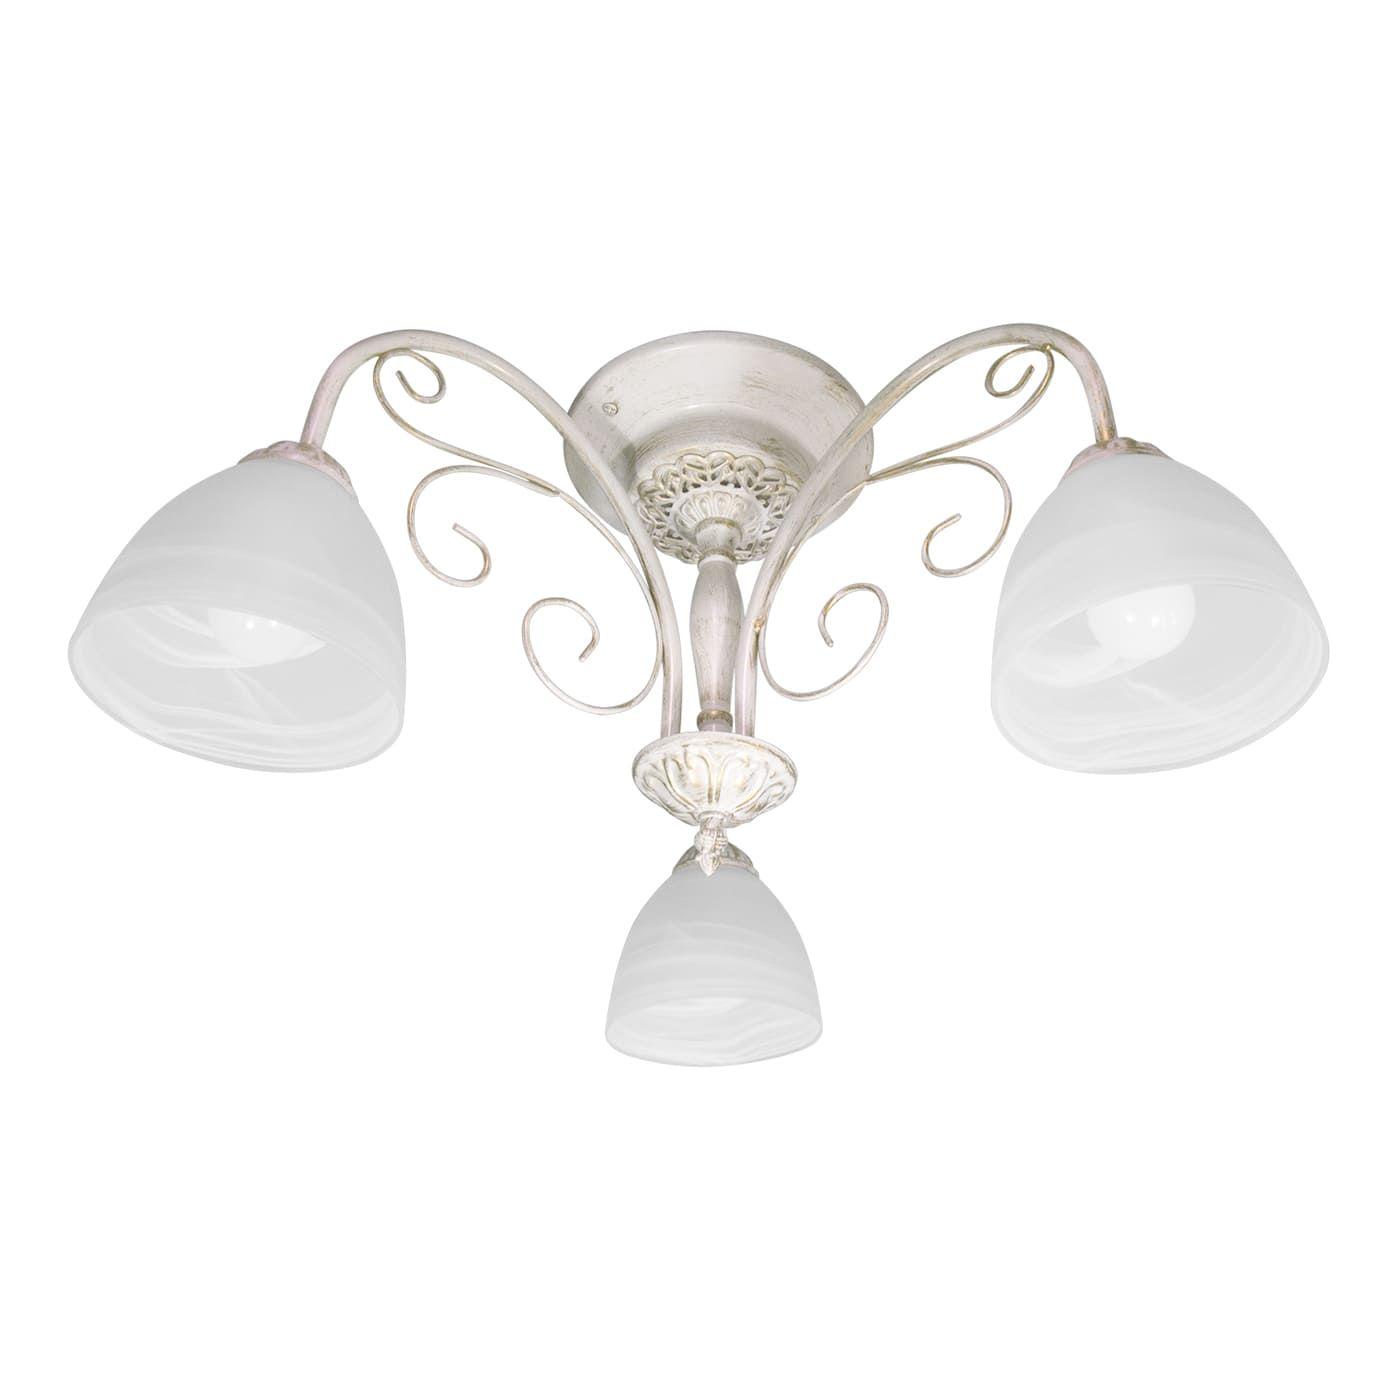 PETRASVET / Ceiling chandelier S2406-3, 3xE27 max. 60W